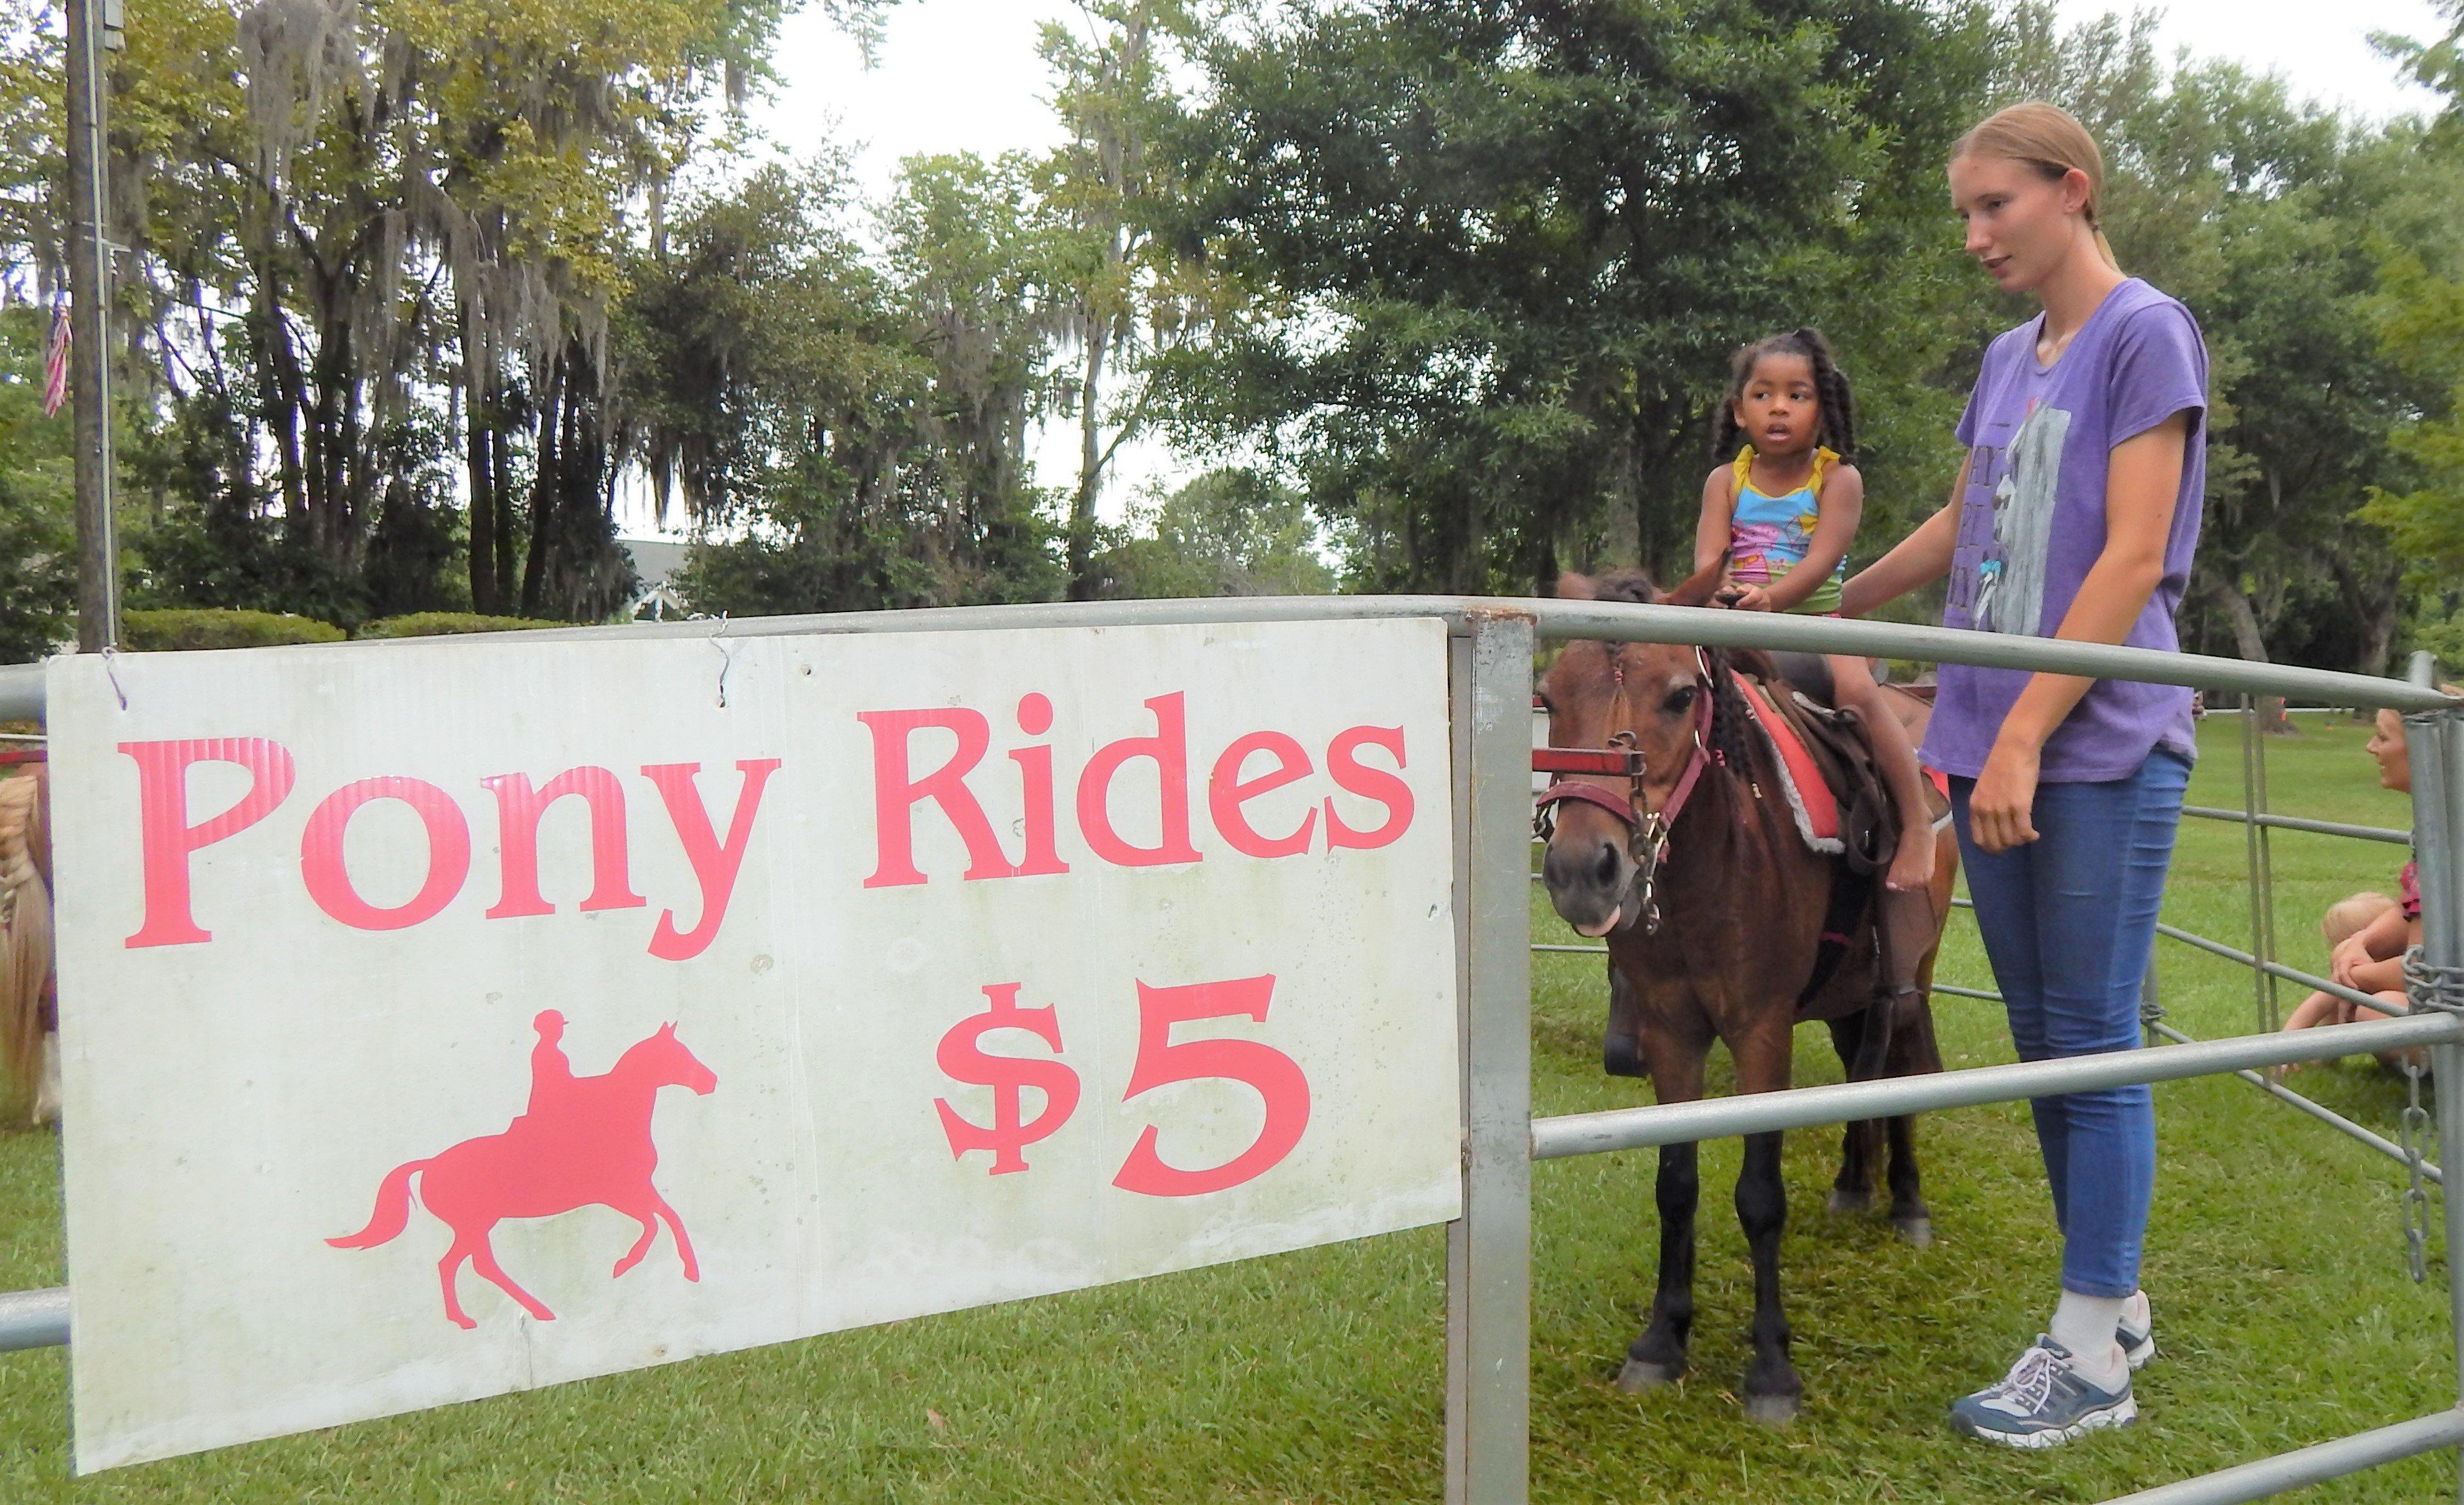 Kids enjoyed the pony rides for $5. Photo by Mark Swendra.